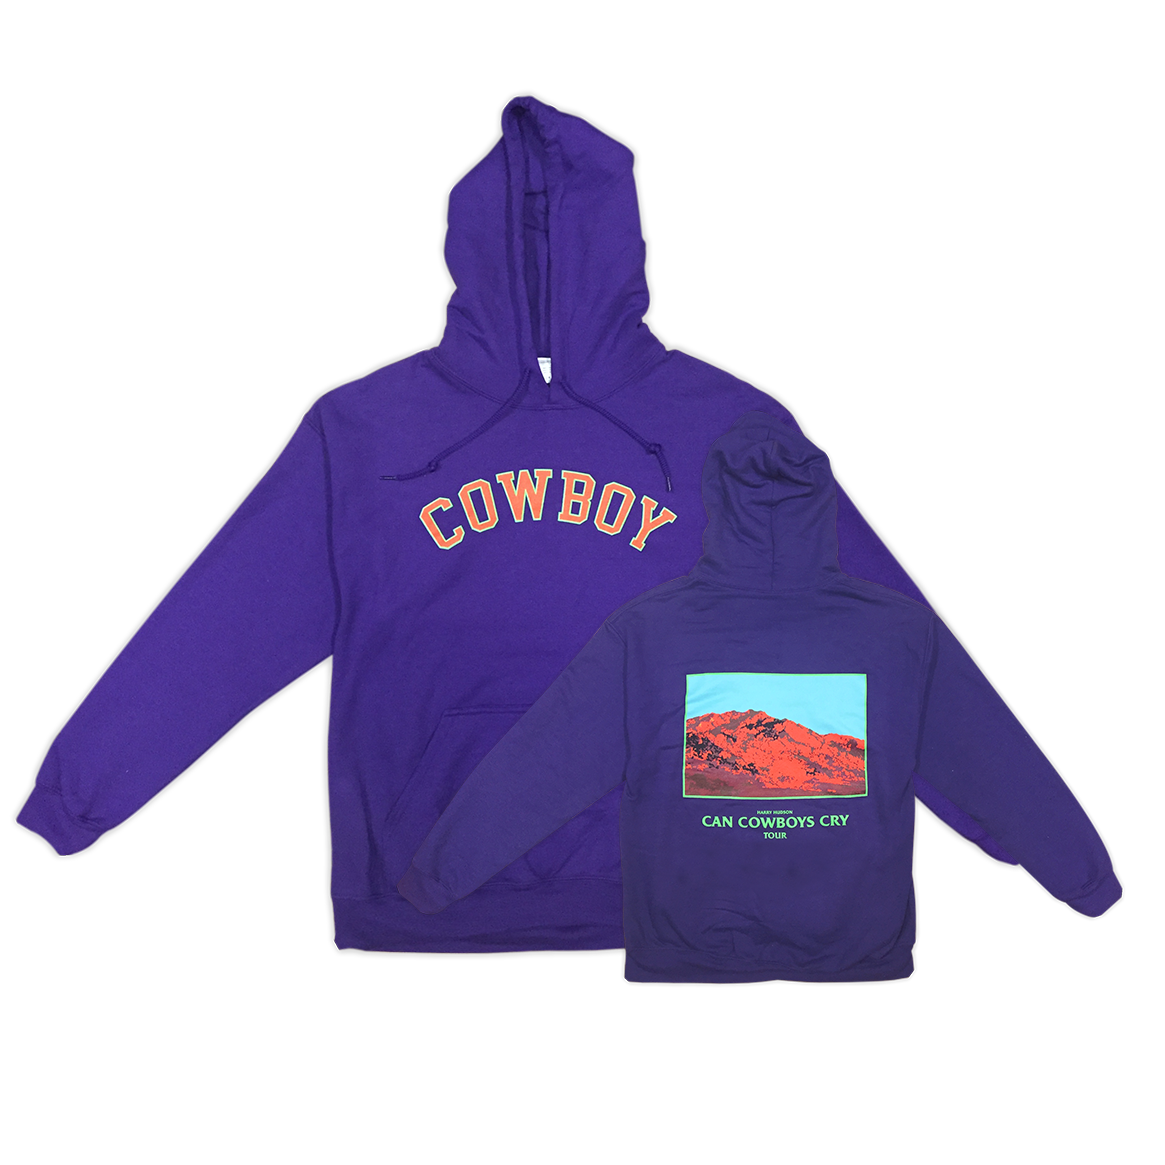 hh_cowboyhoodie_purple_NODATES.png